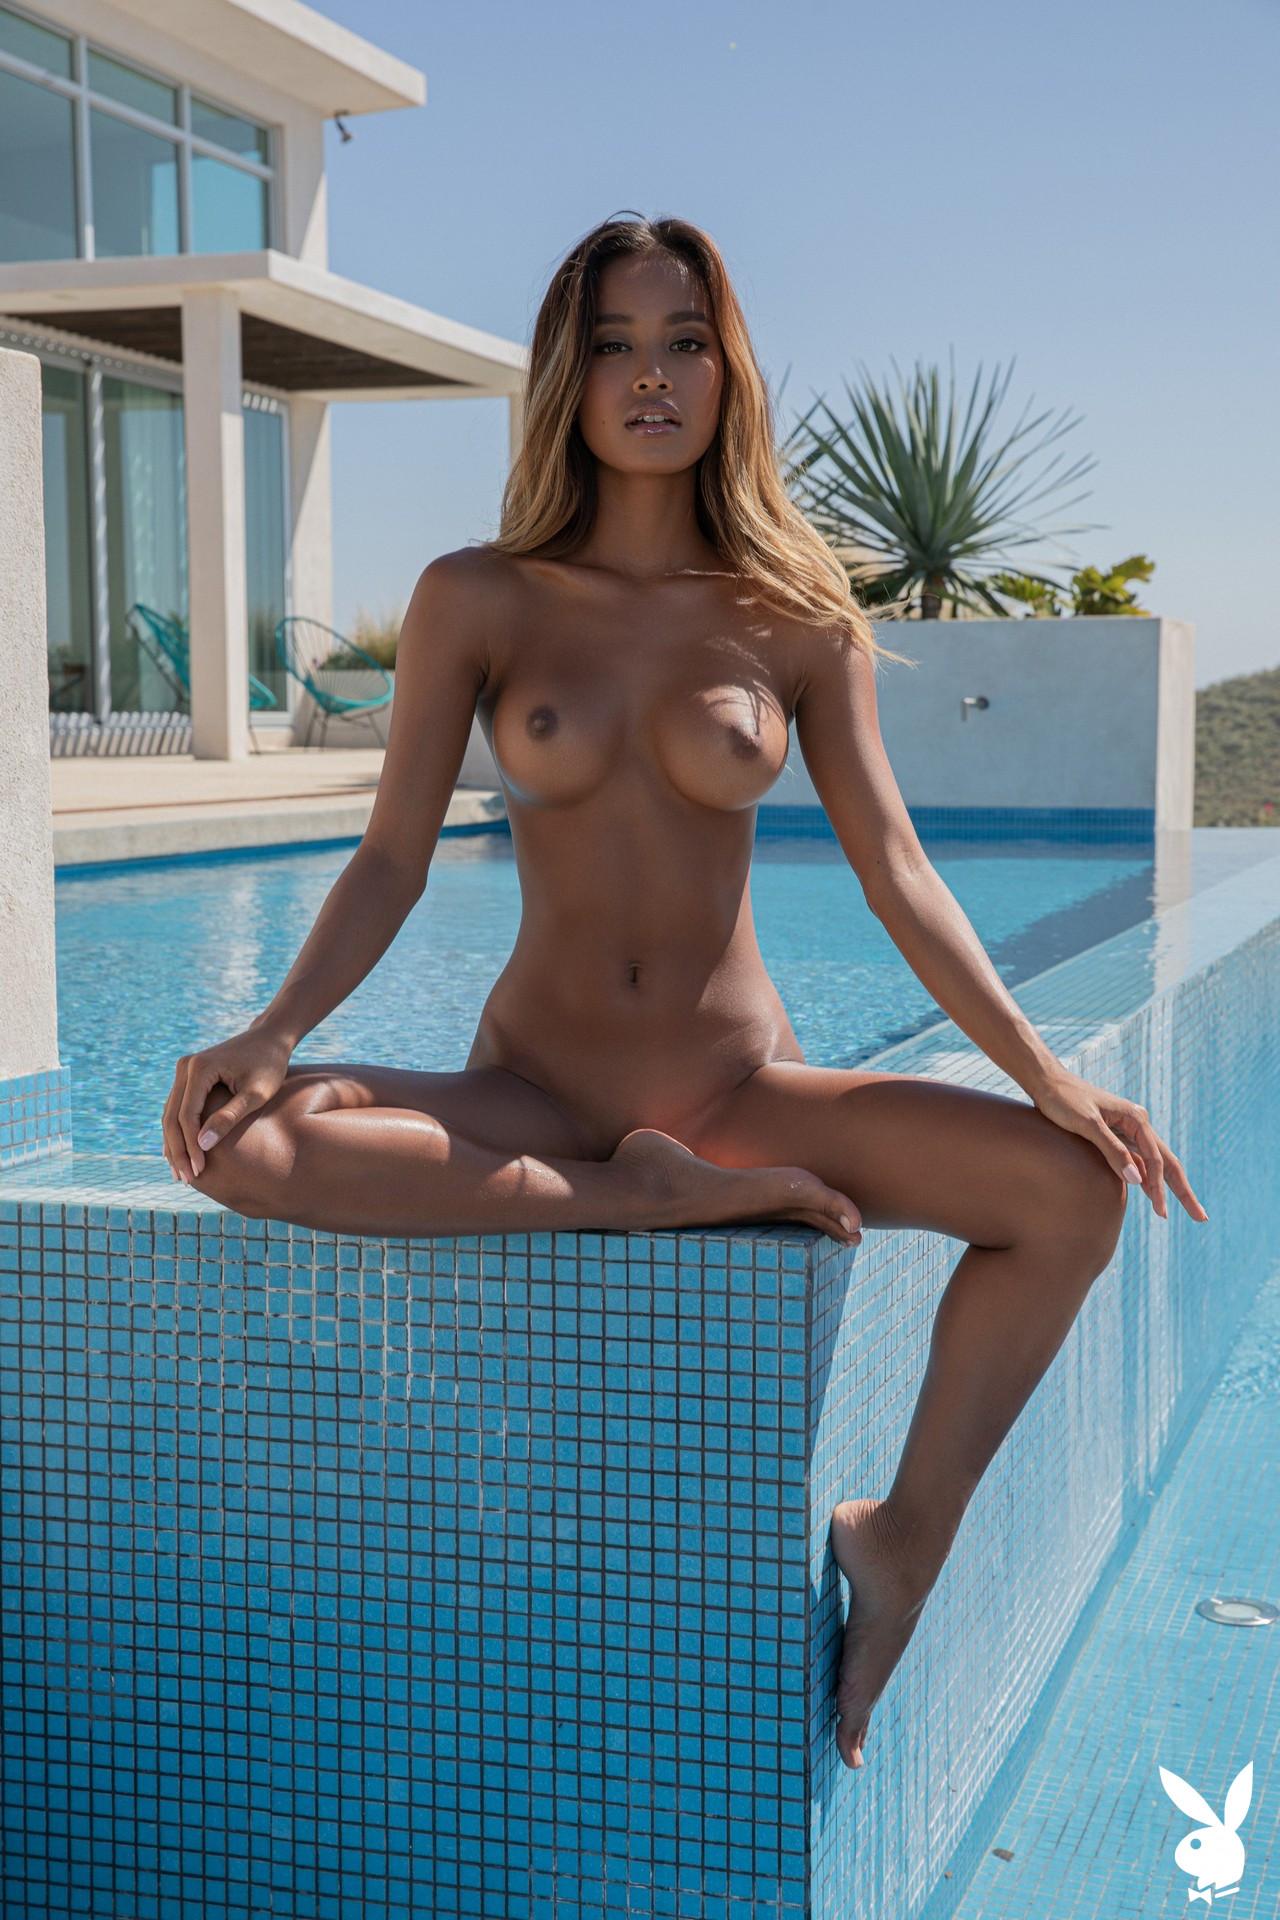 Putri Cinta In Feel The Heat Playboy Plus (15)